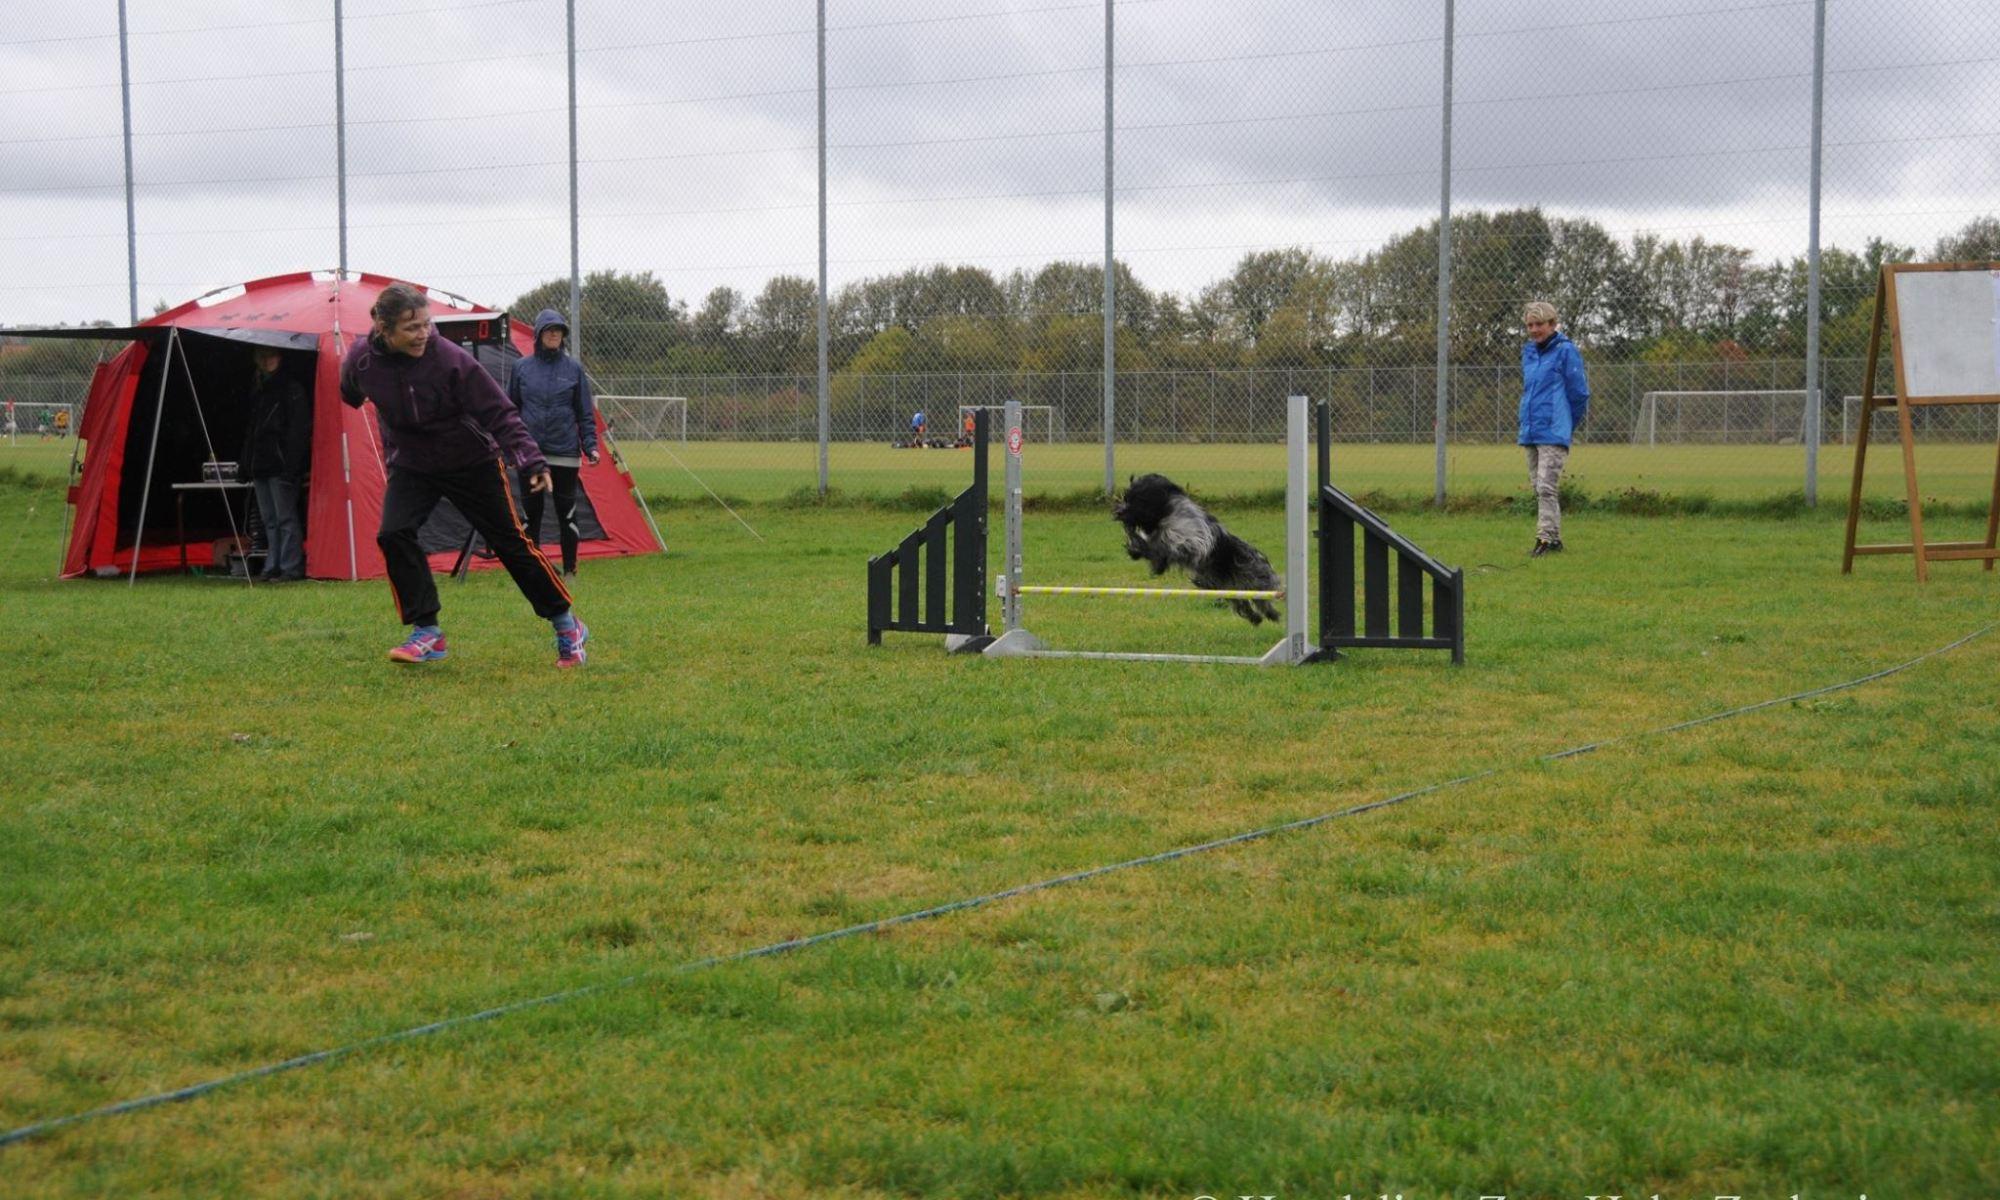 Schapendoes agility